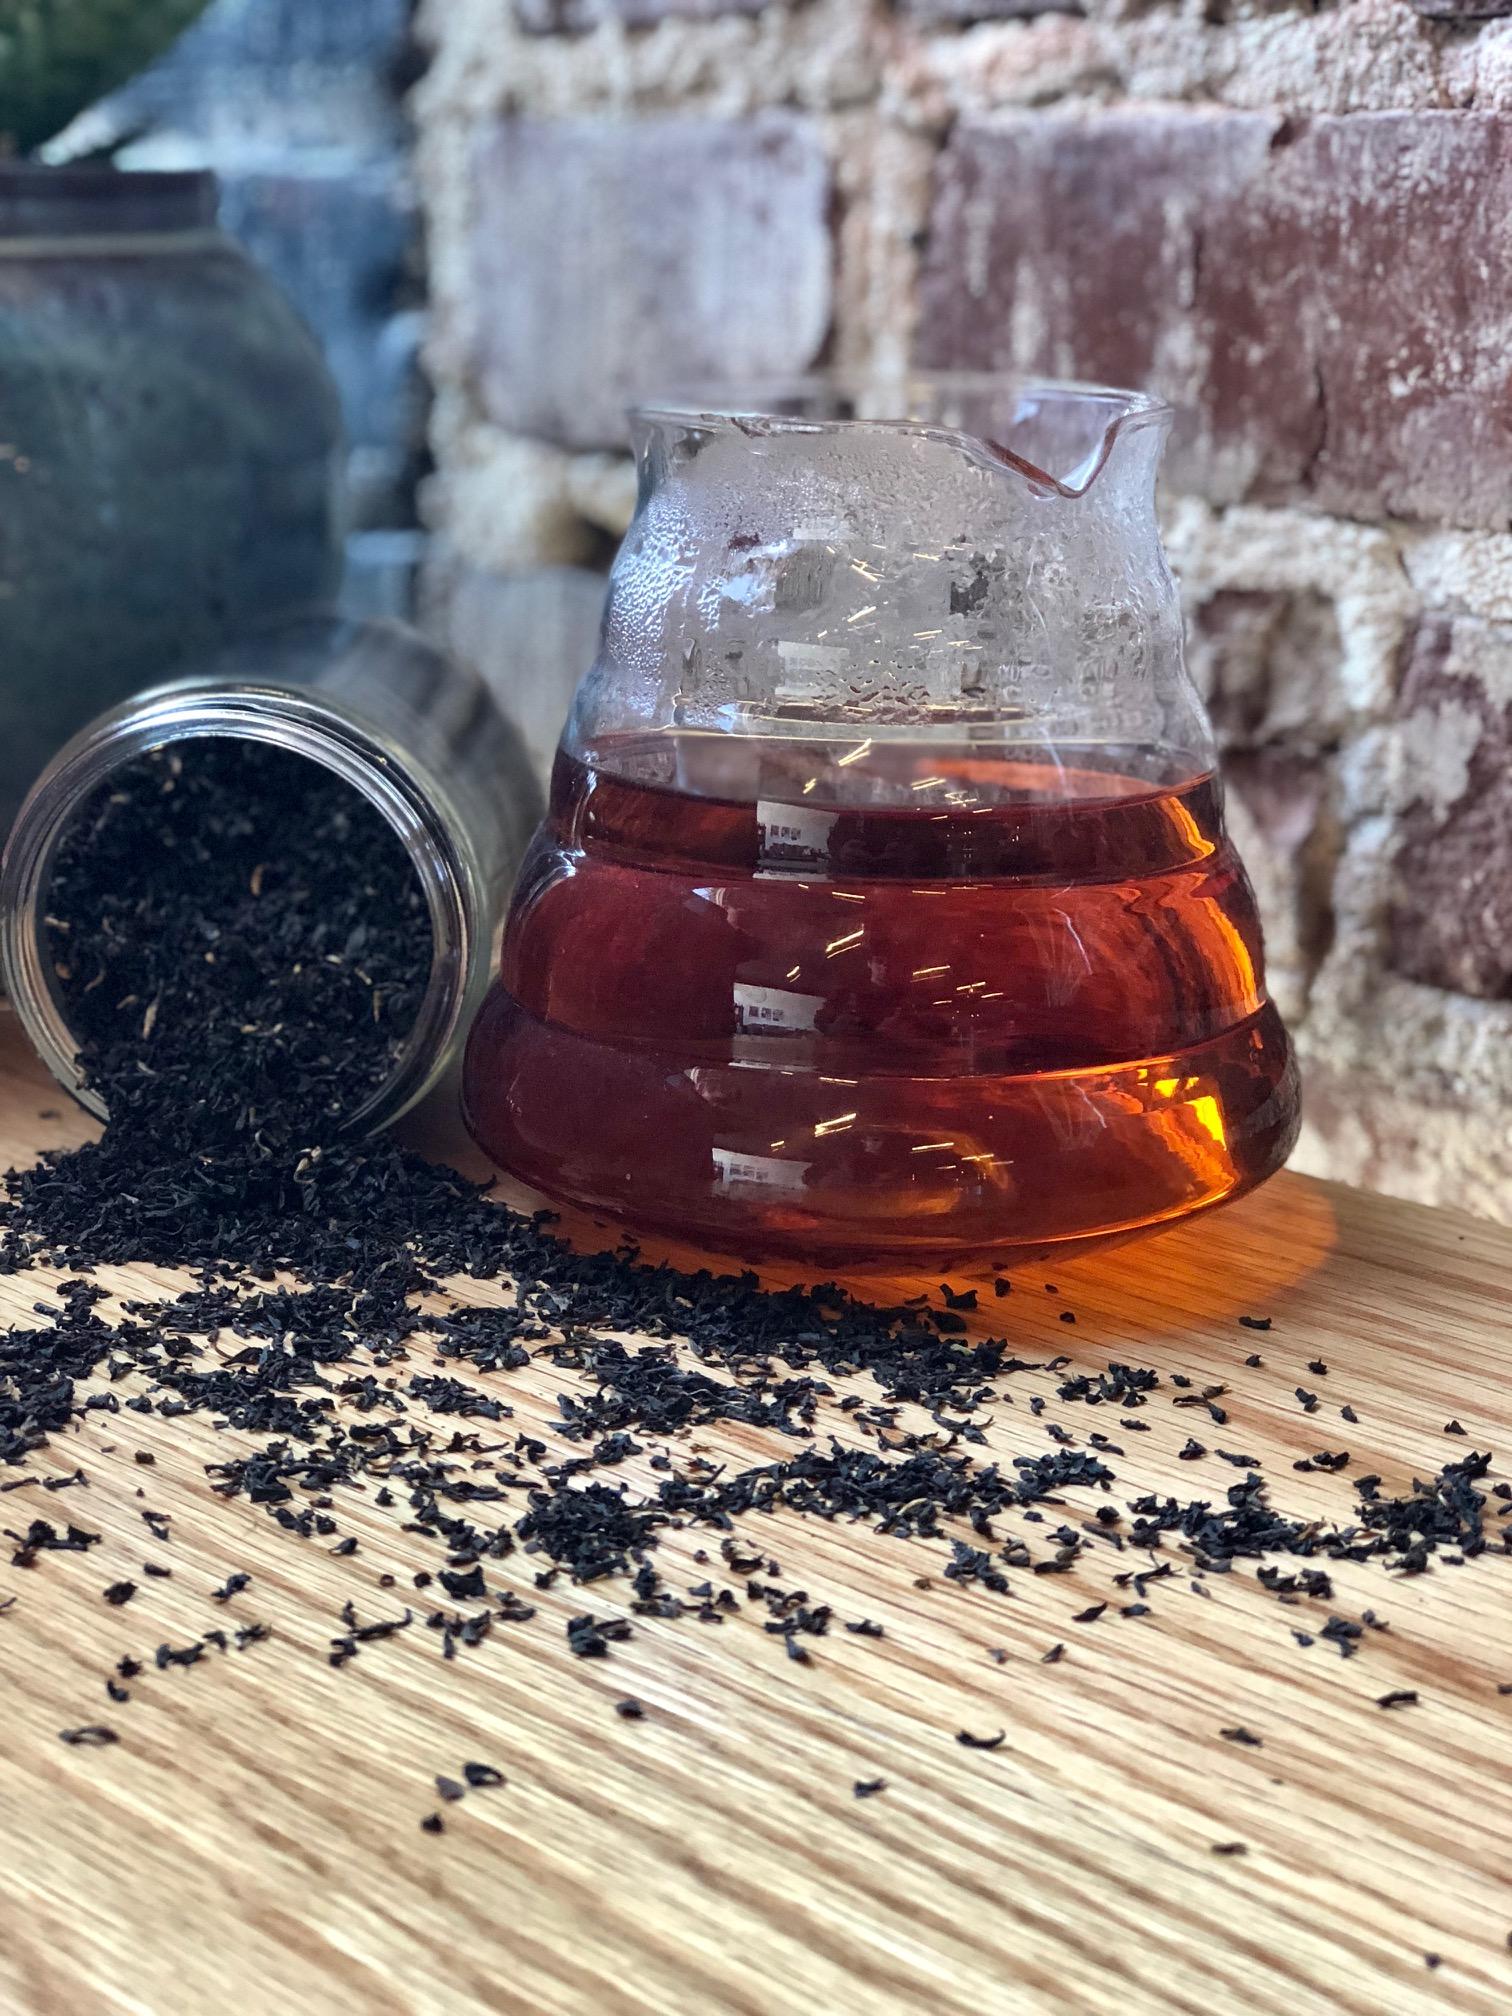 Hot Tea: $3.00